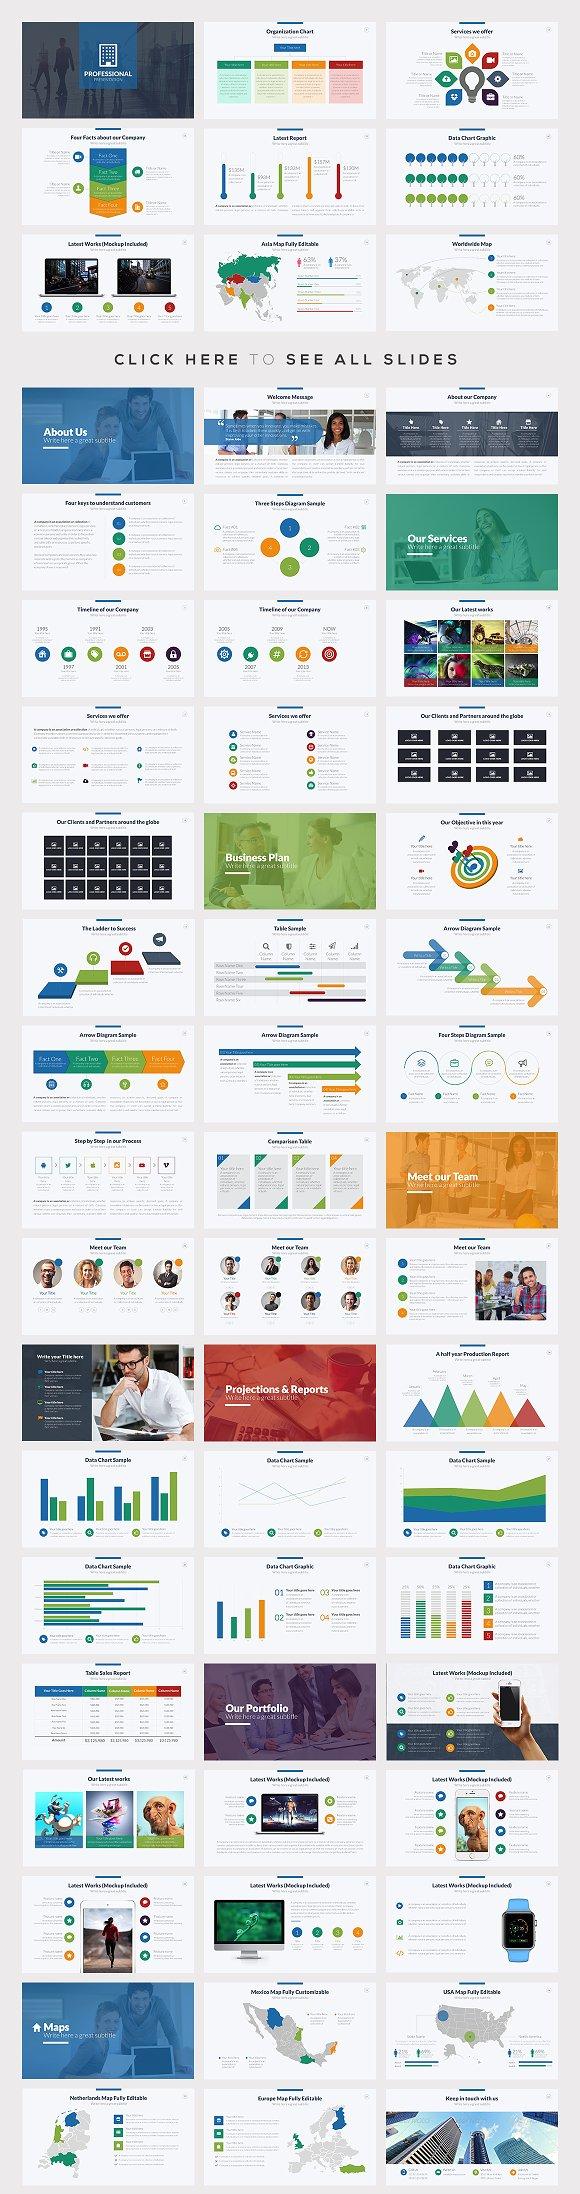 best powerpoint templates bundle presentation templates creative